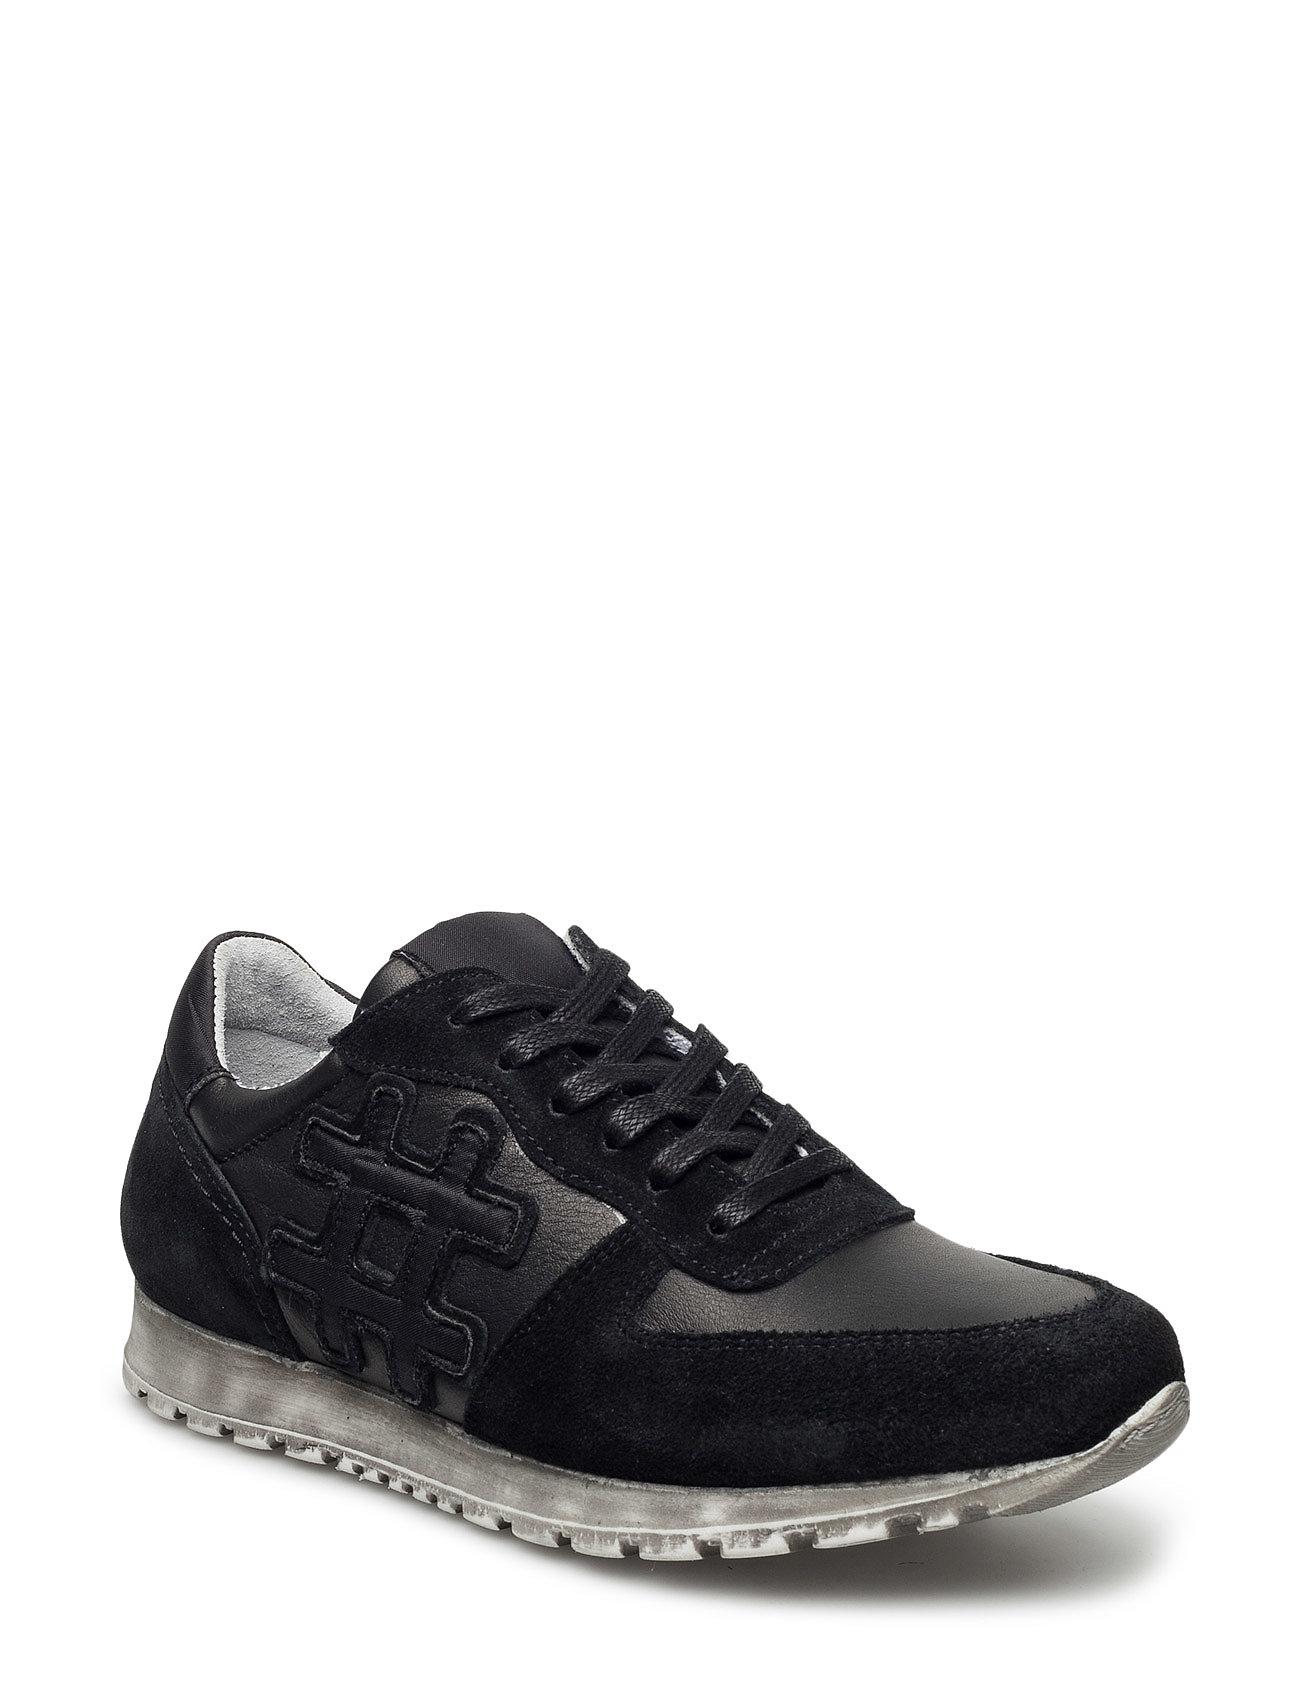 Sneakers CASHOTT Sko til Kvinder i